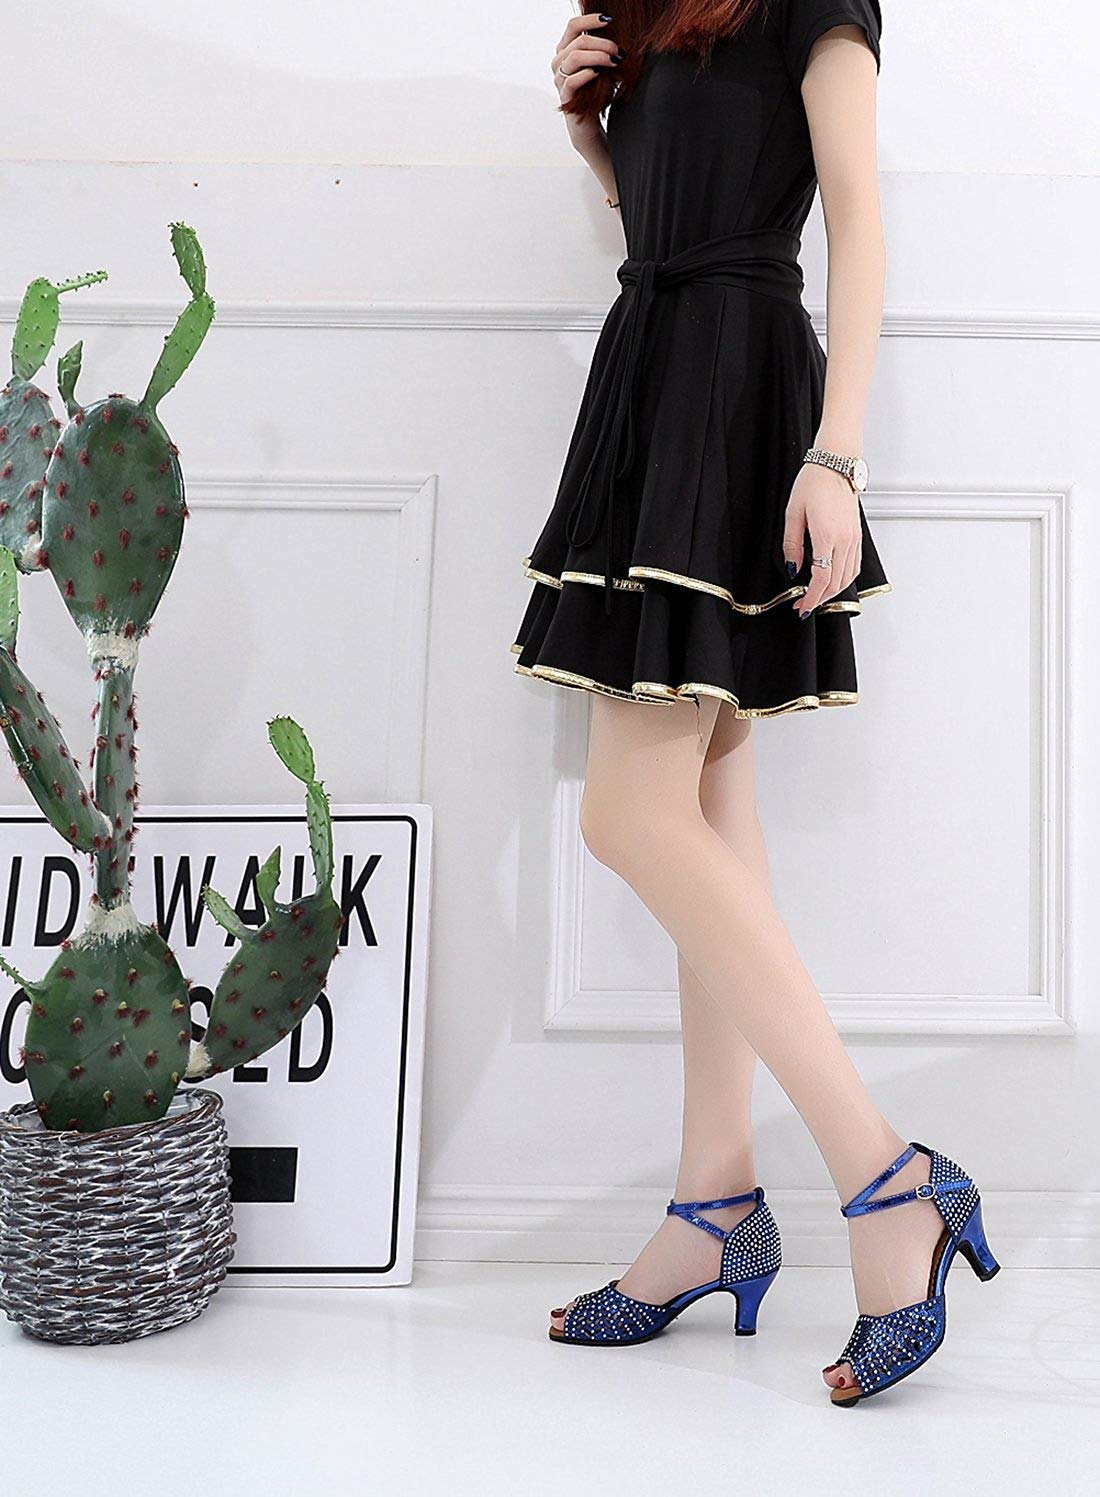 Qiusa Ladies Ladies Ladies Cut-Out Funkelnde niedrige Ferse blau synthetische Tanzsandalen UK 4.5 (Farbe   Blau-4  Heel Größe   -) 48e27c